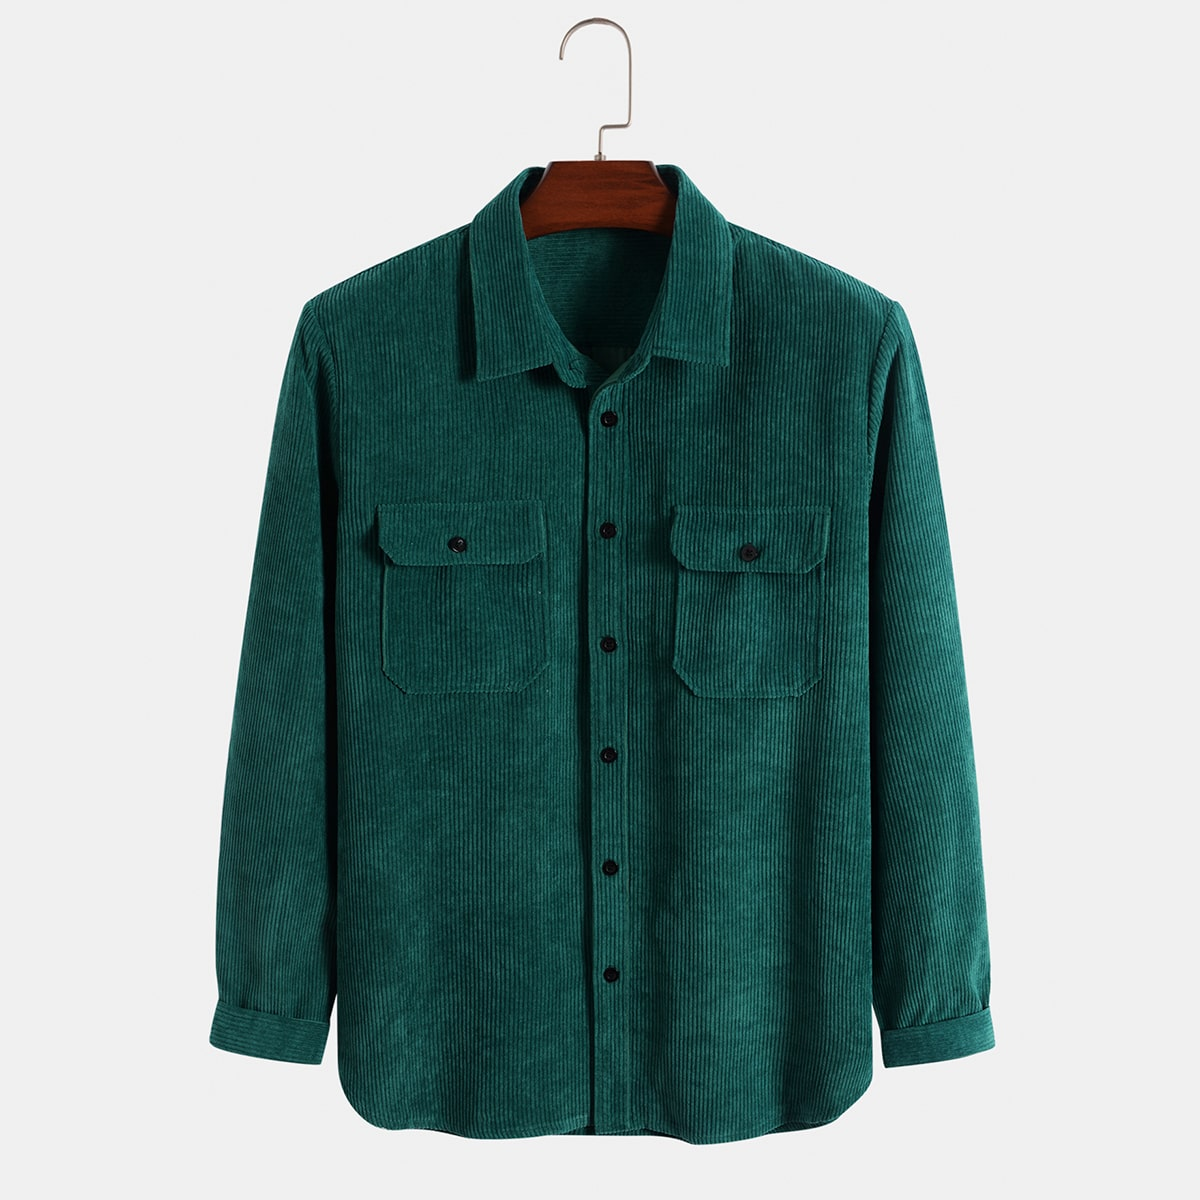 Мужская вельветовая рубашка с карманом на пуговицах SheIn sM210610523394229